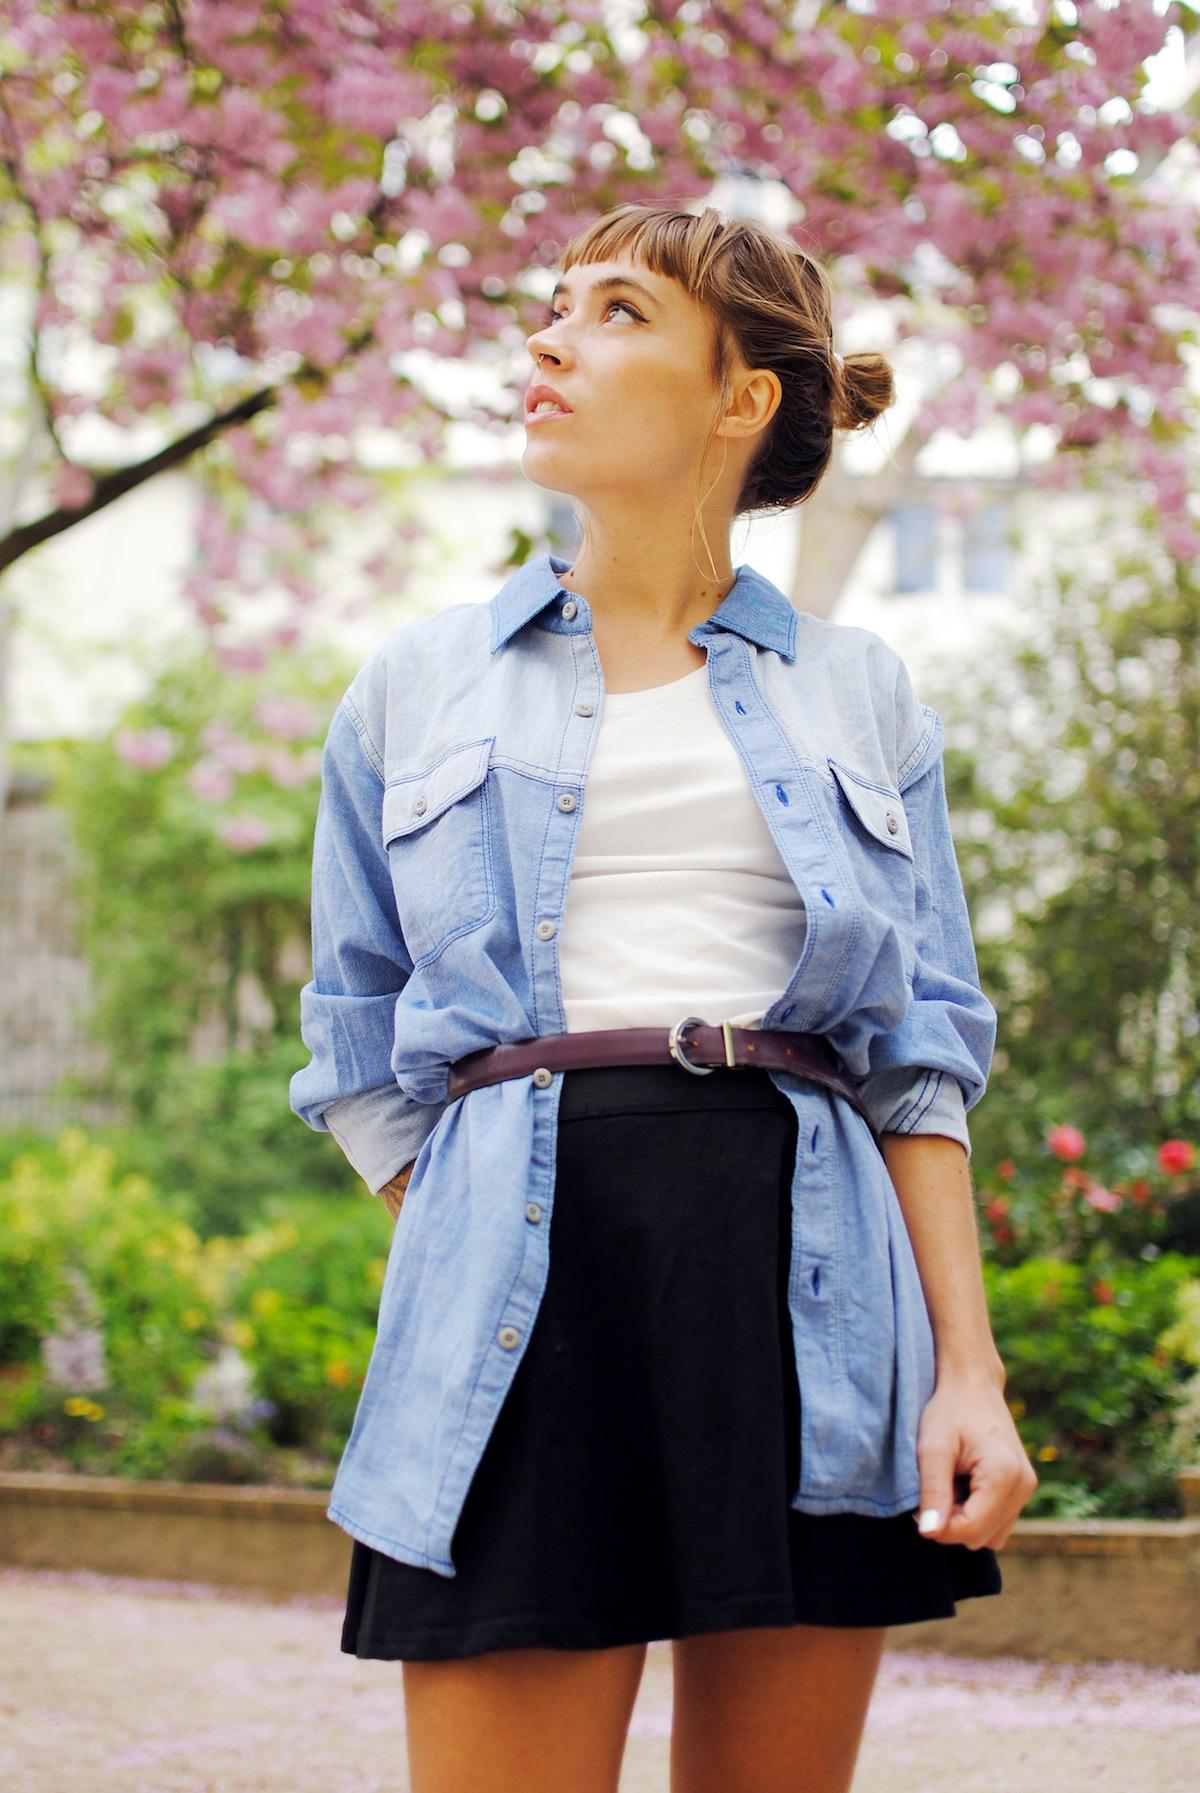 Blog mode look denim et jupe noire